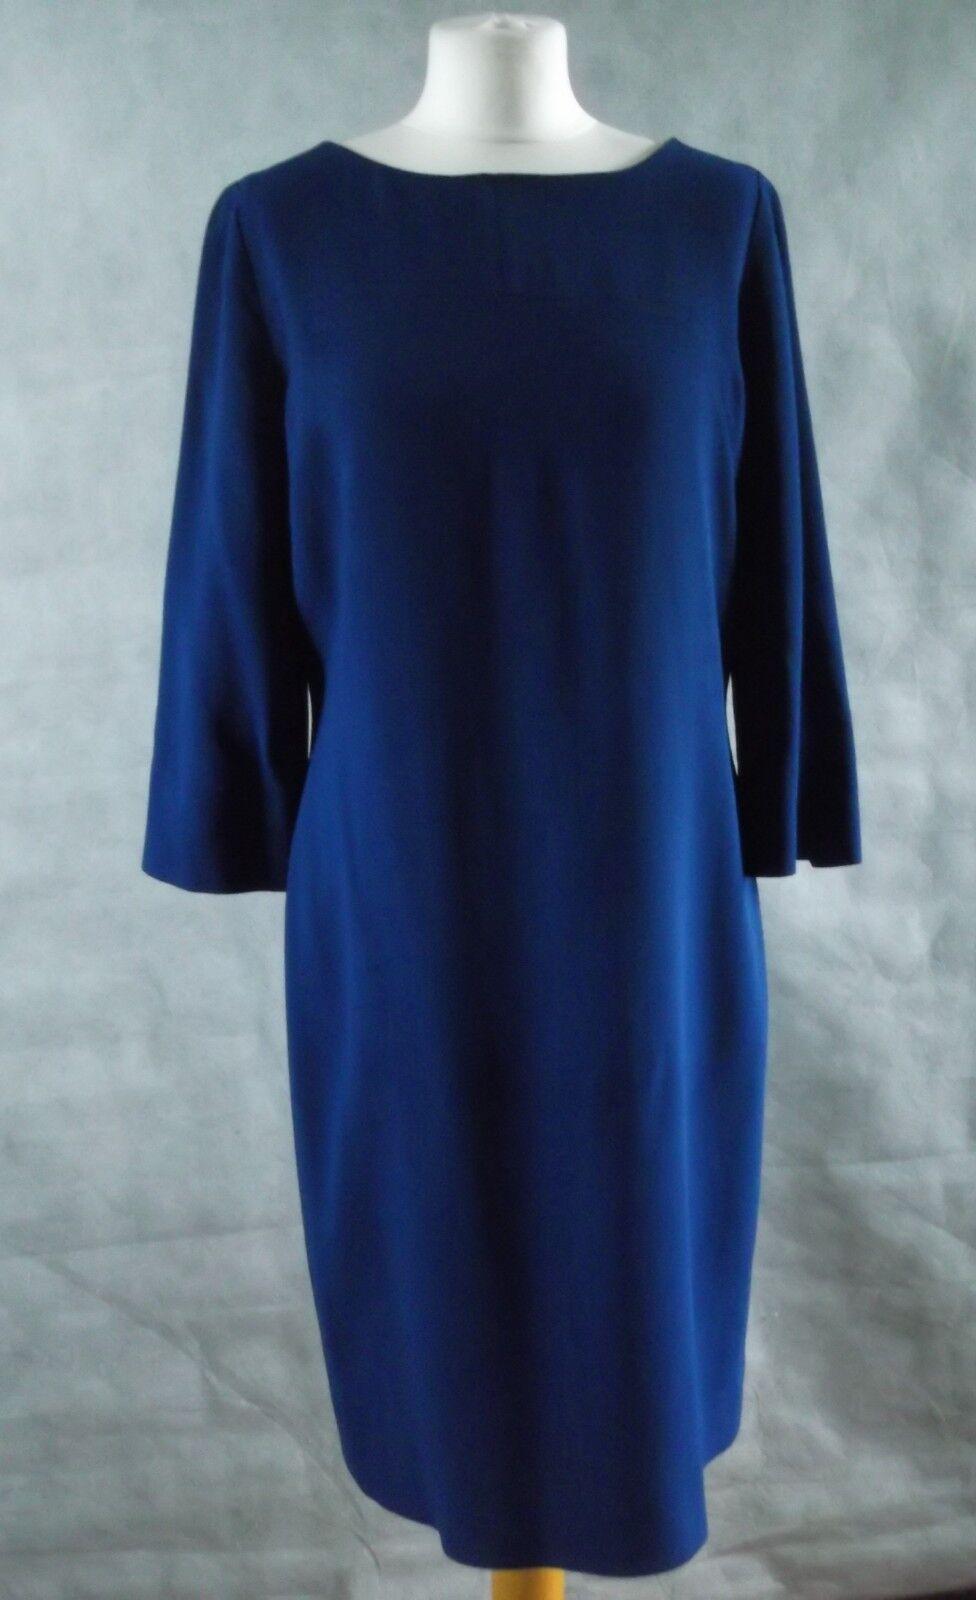 HOBBS HOBBS HOBBS size 14 bluee tunic dress wool long sleeved lined 3ae7c5